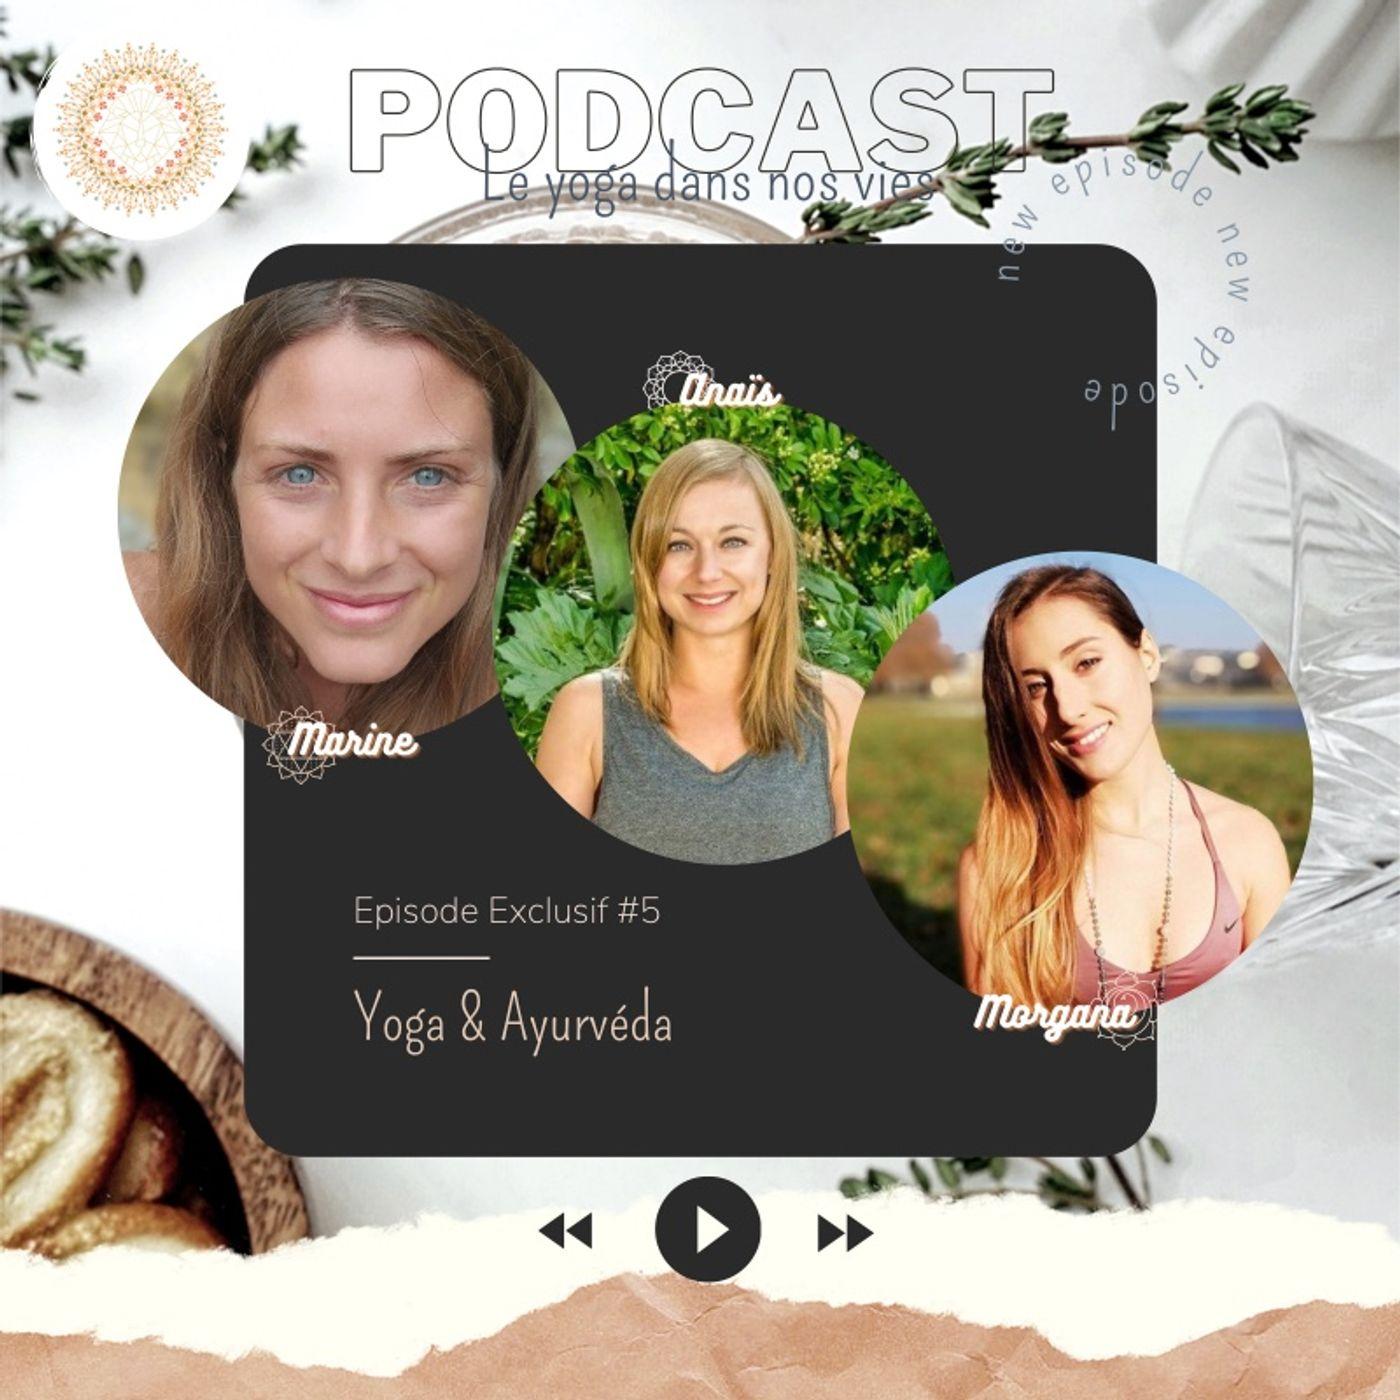 Exclu #5 : Yoga & Ayurvéda